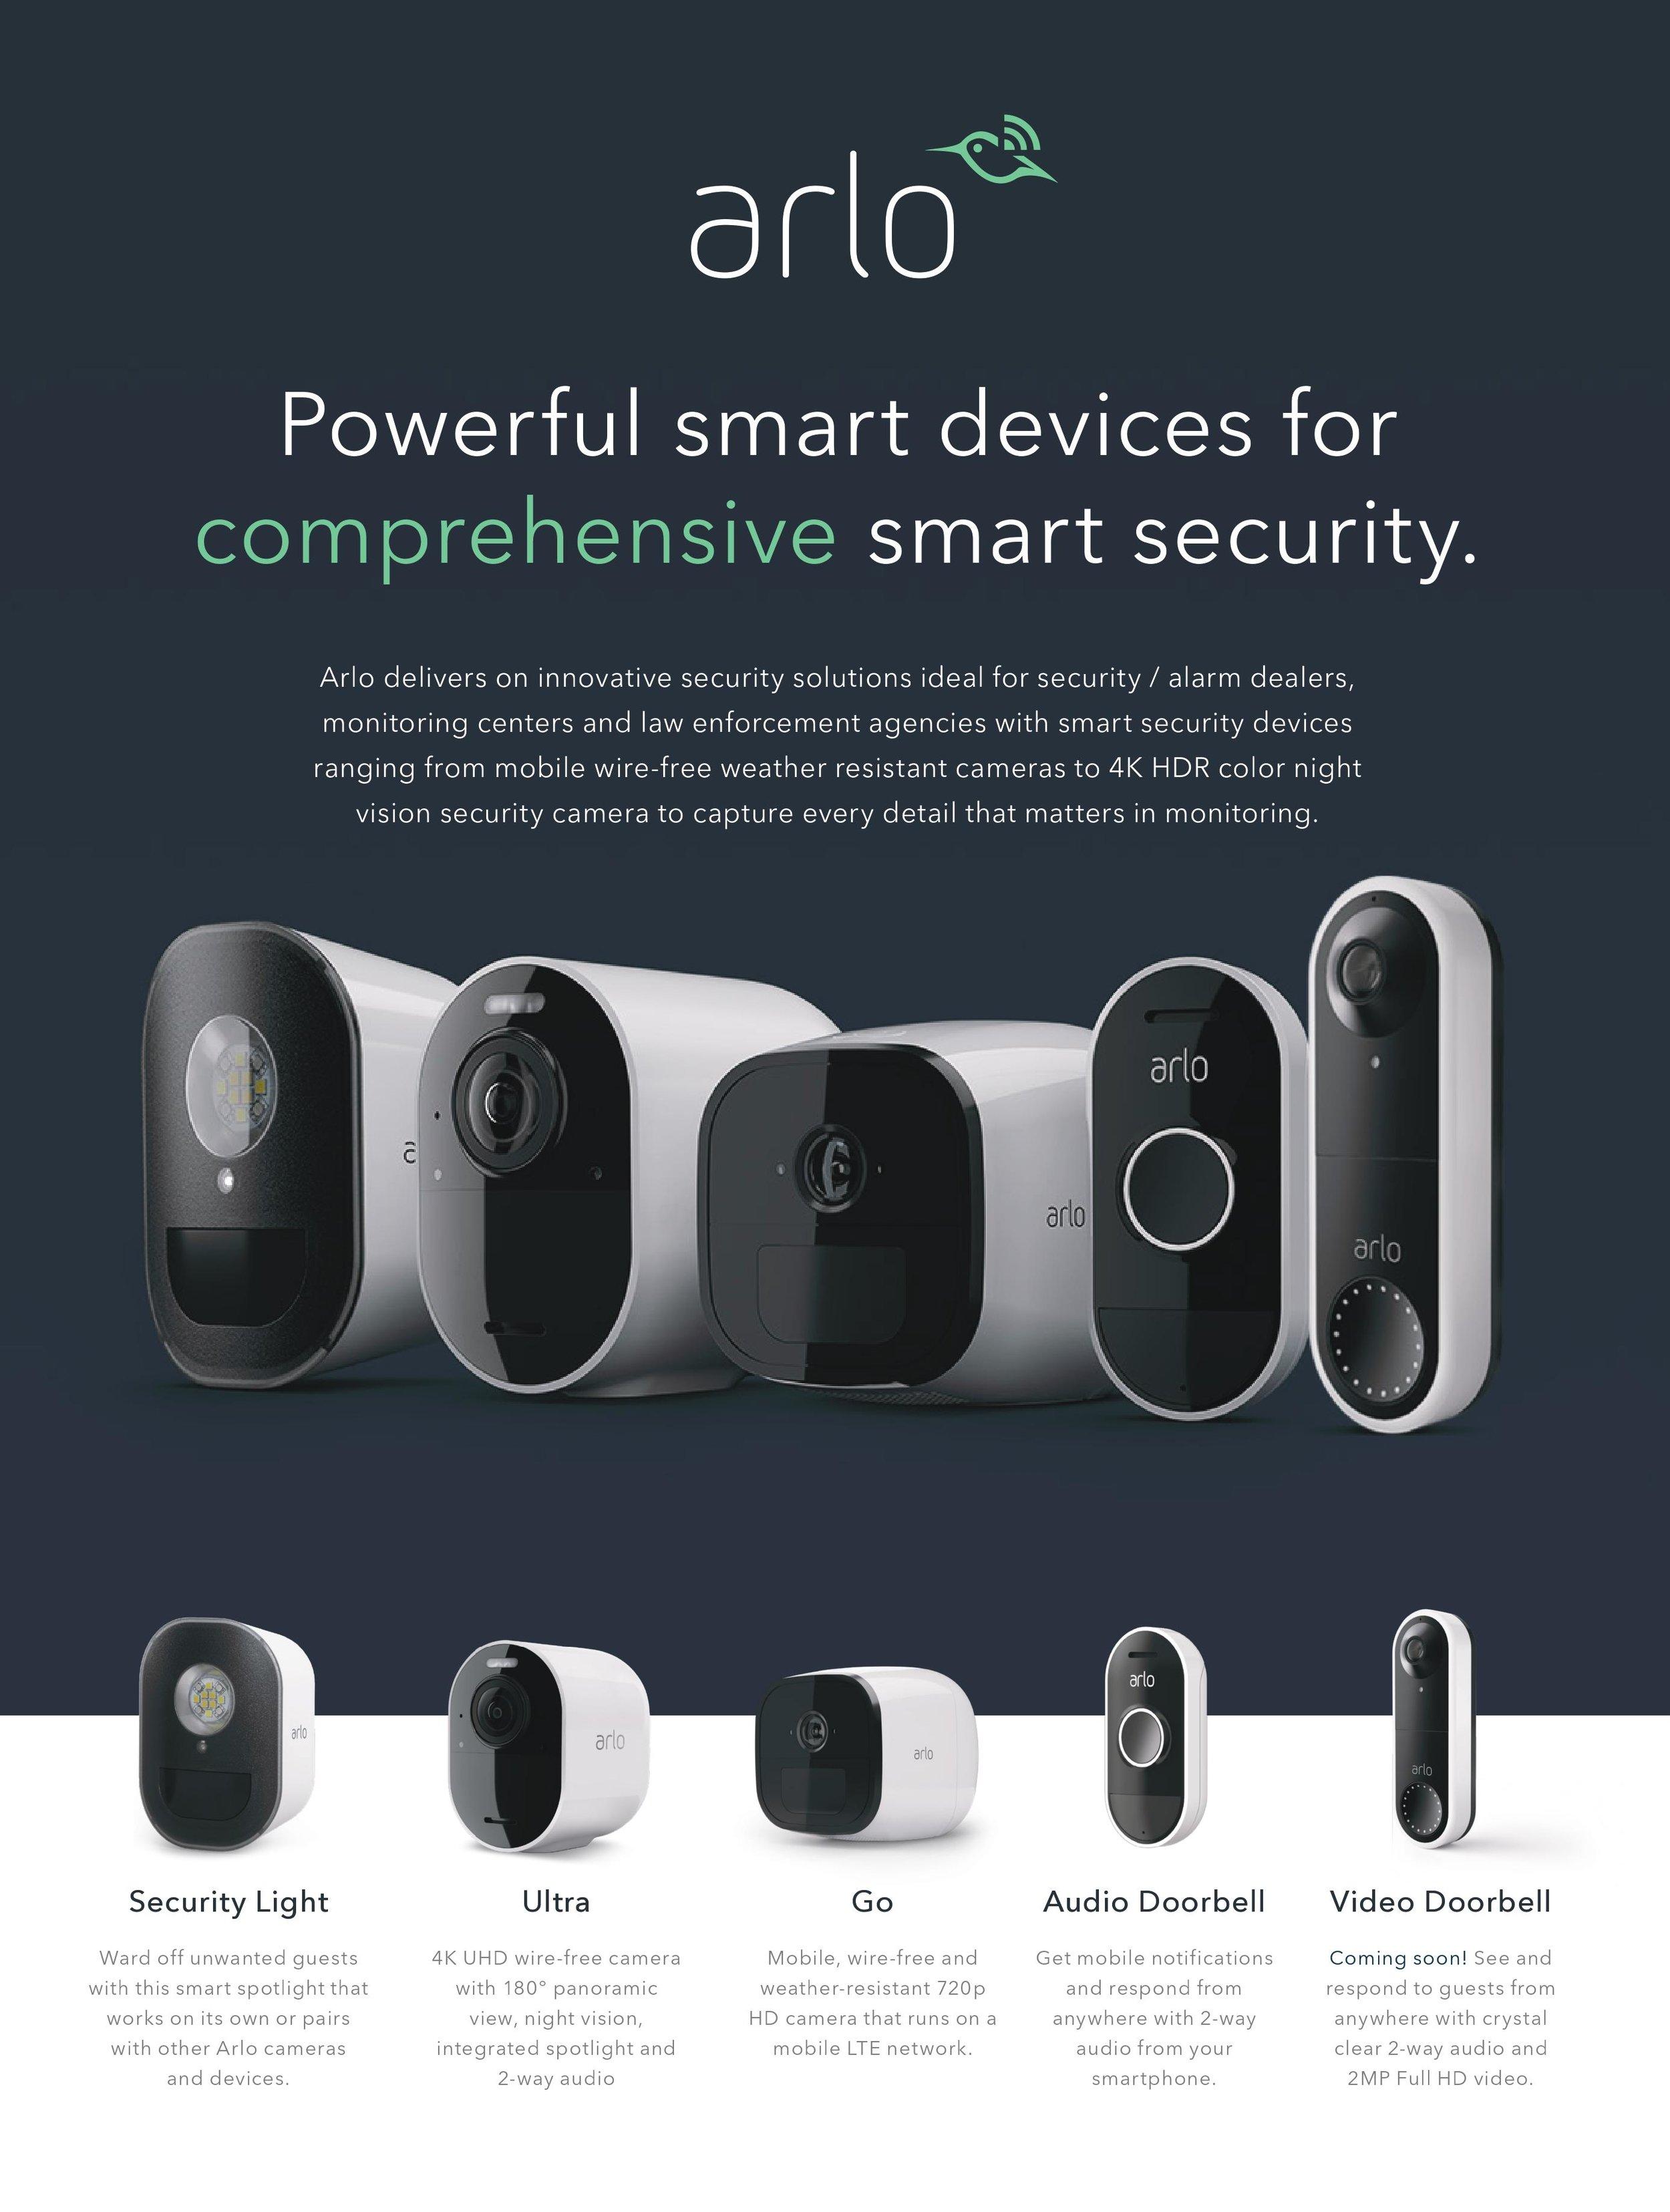 Arlo HD smart video doorbell leaks in new images, HomeKit support unknown